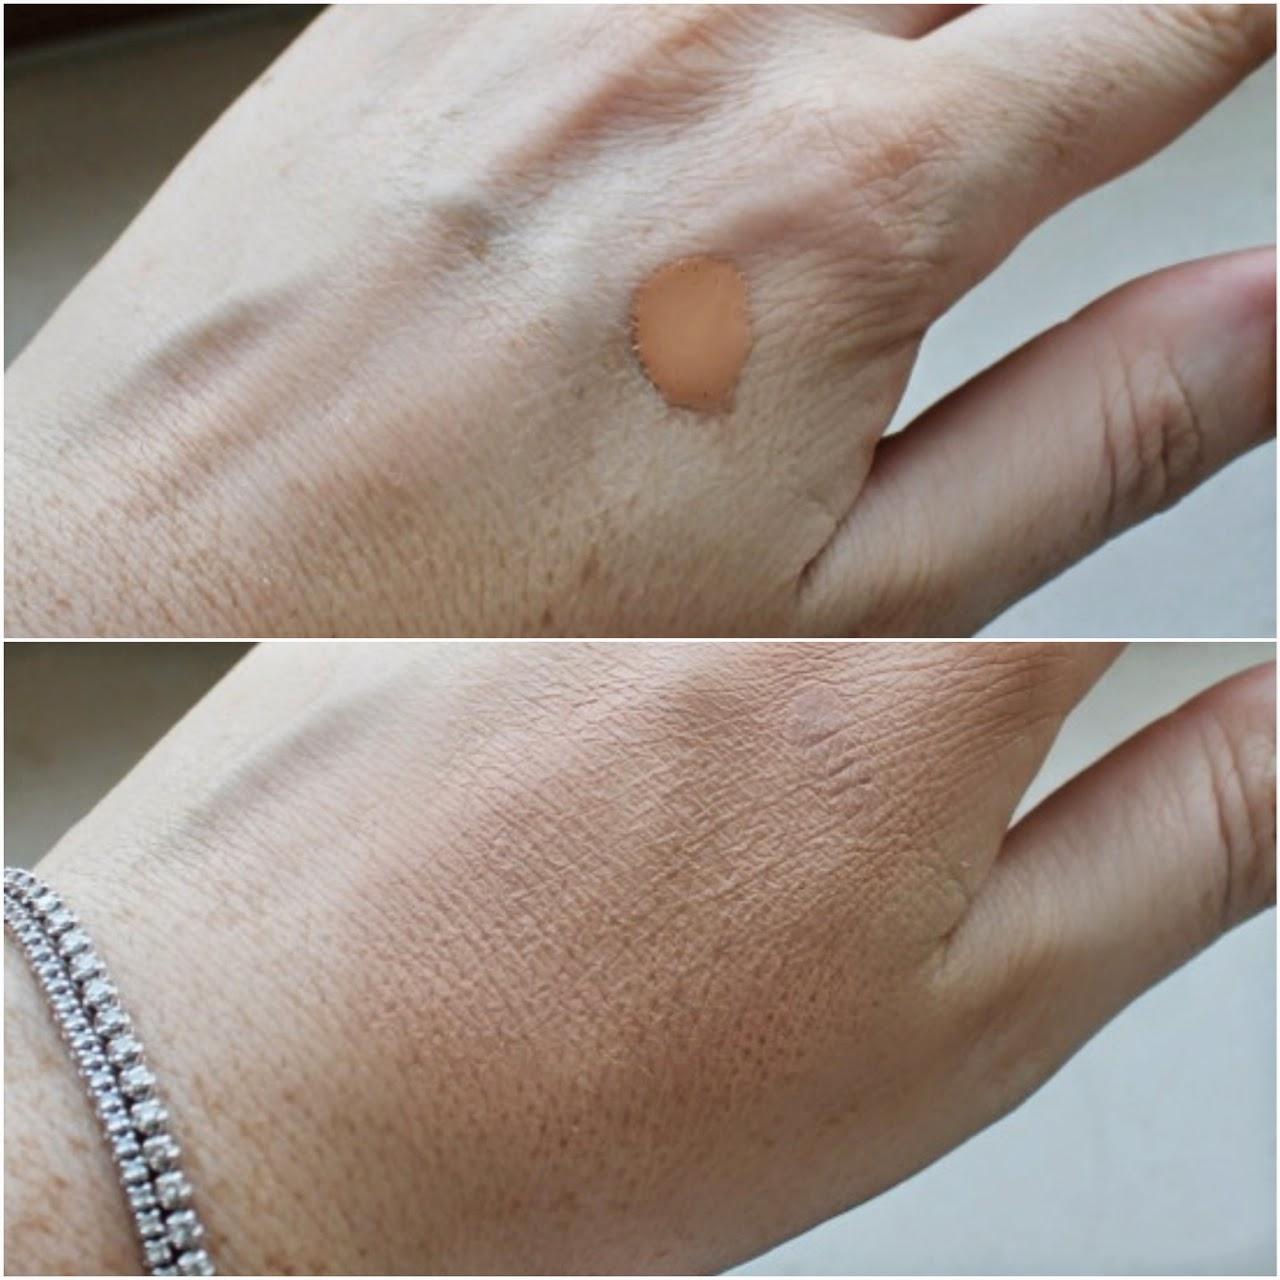 clinique acne solutions